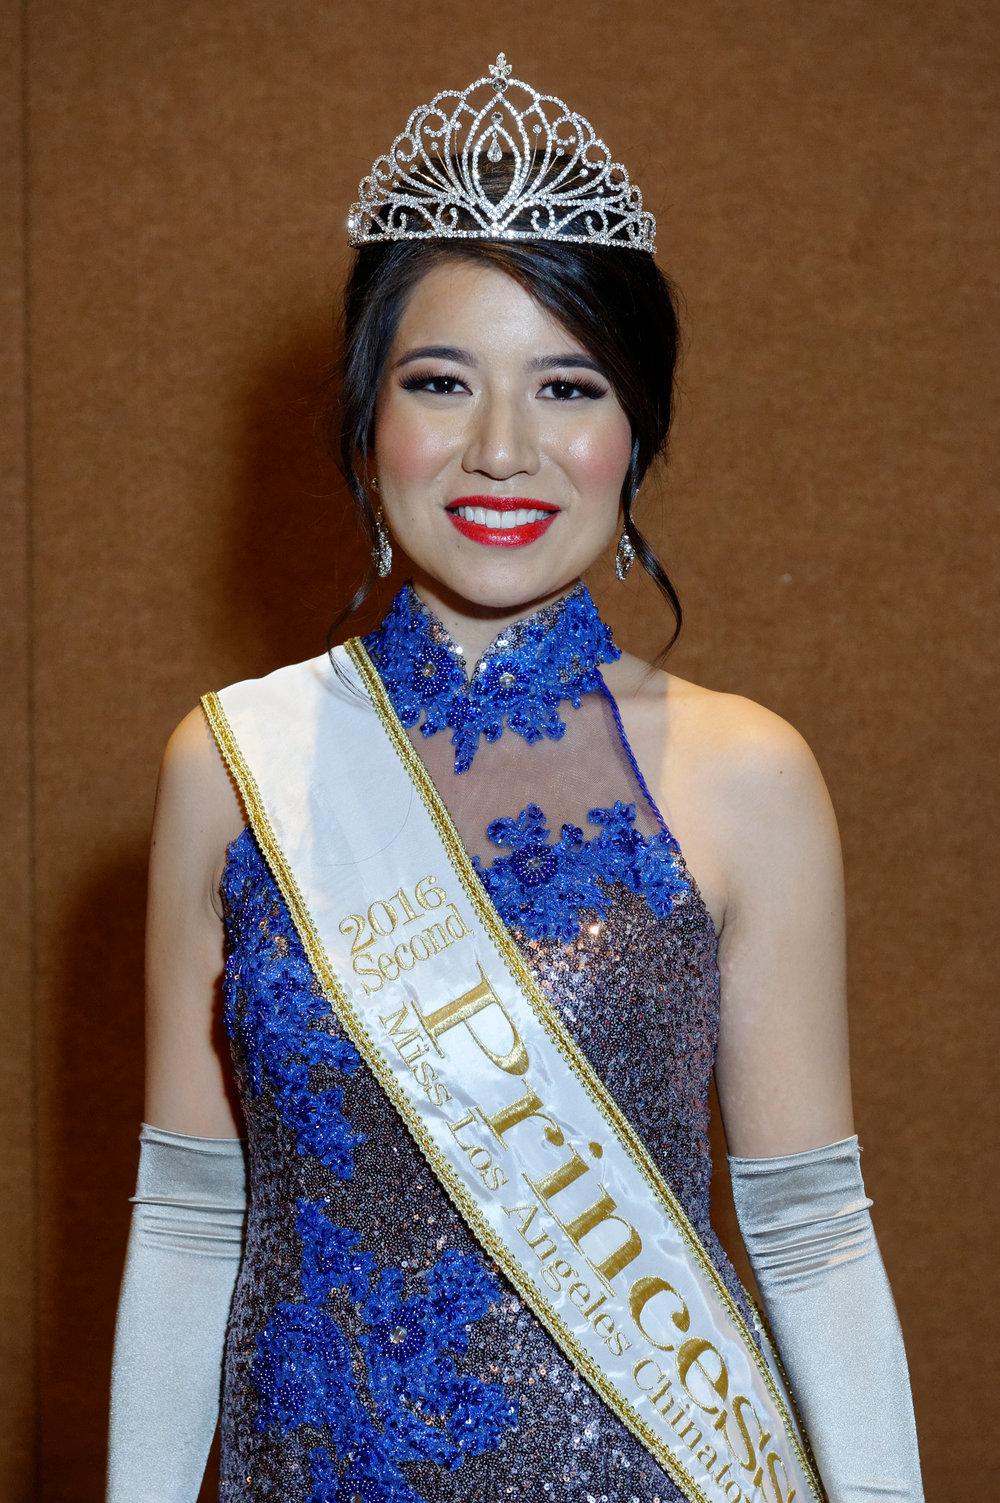 Second Princess, Kristen Phung